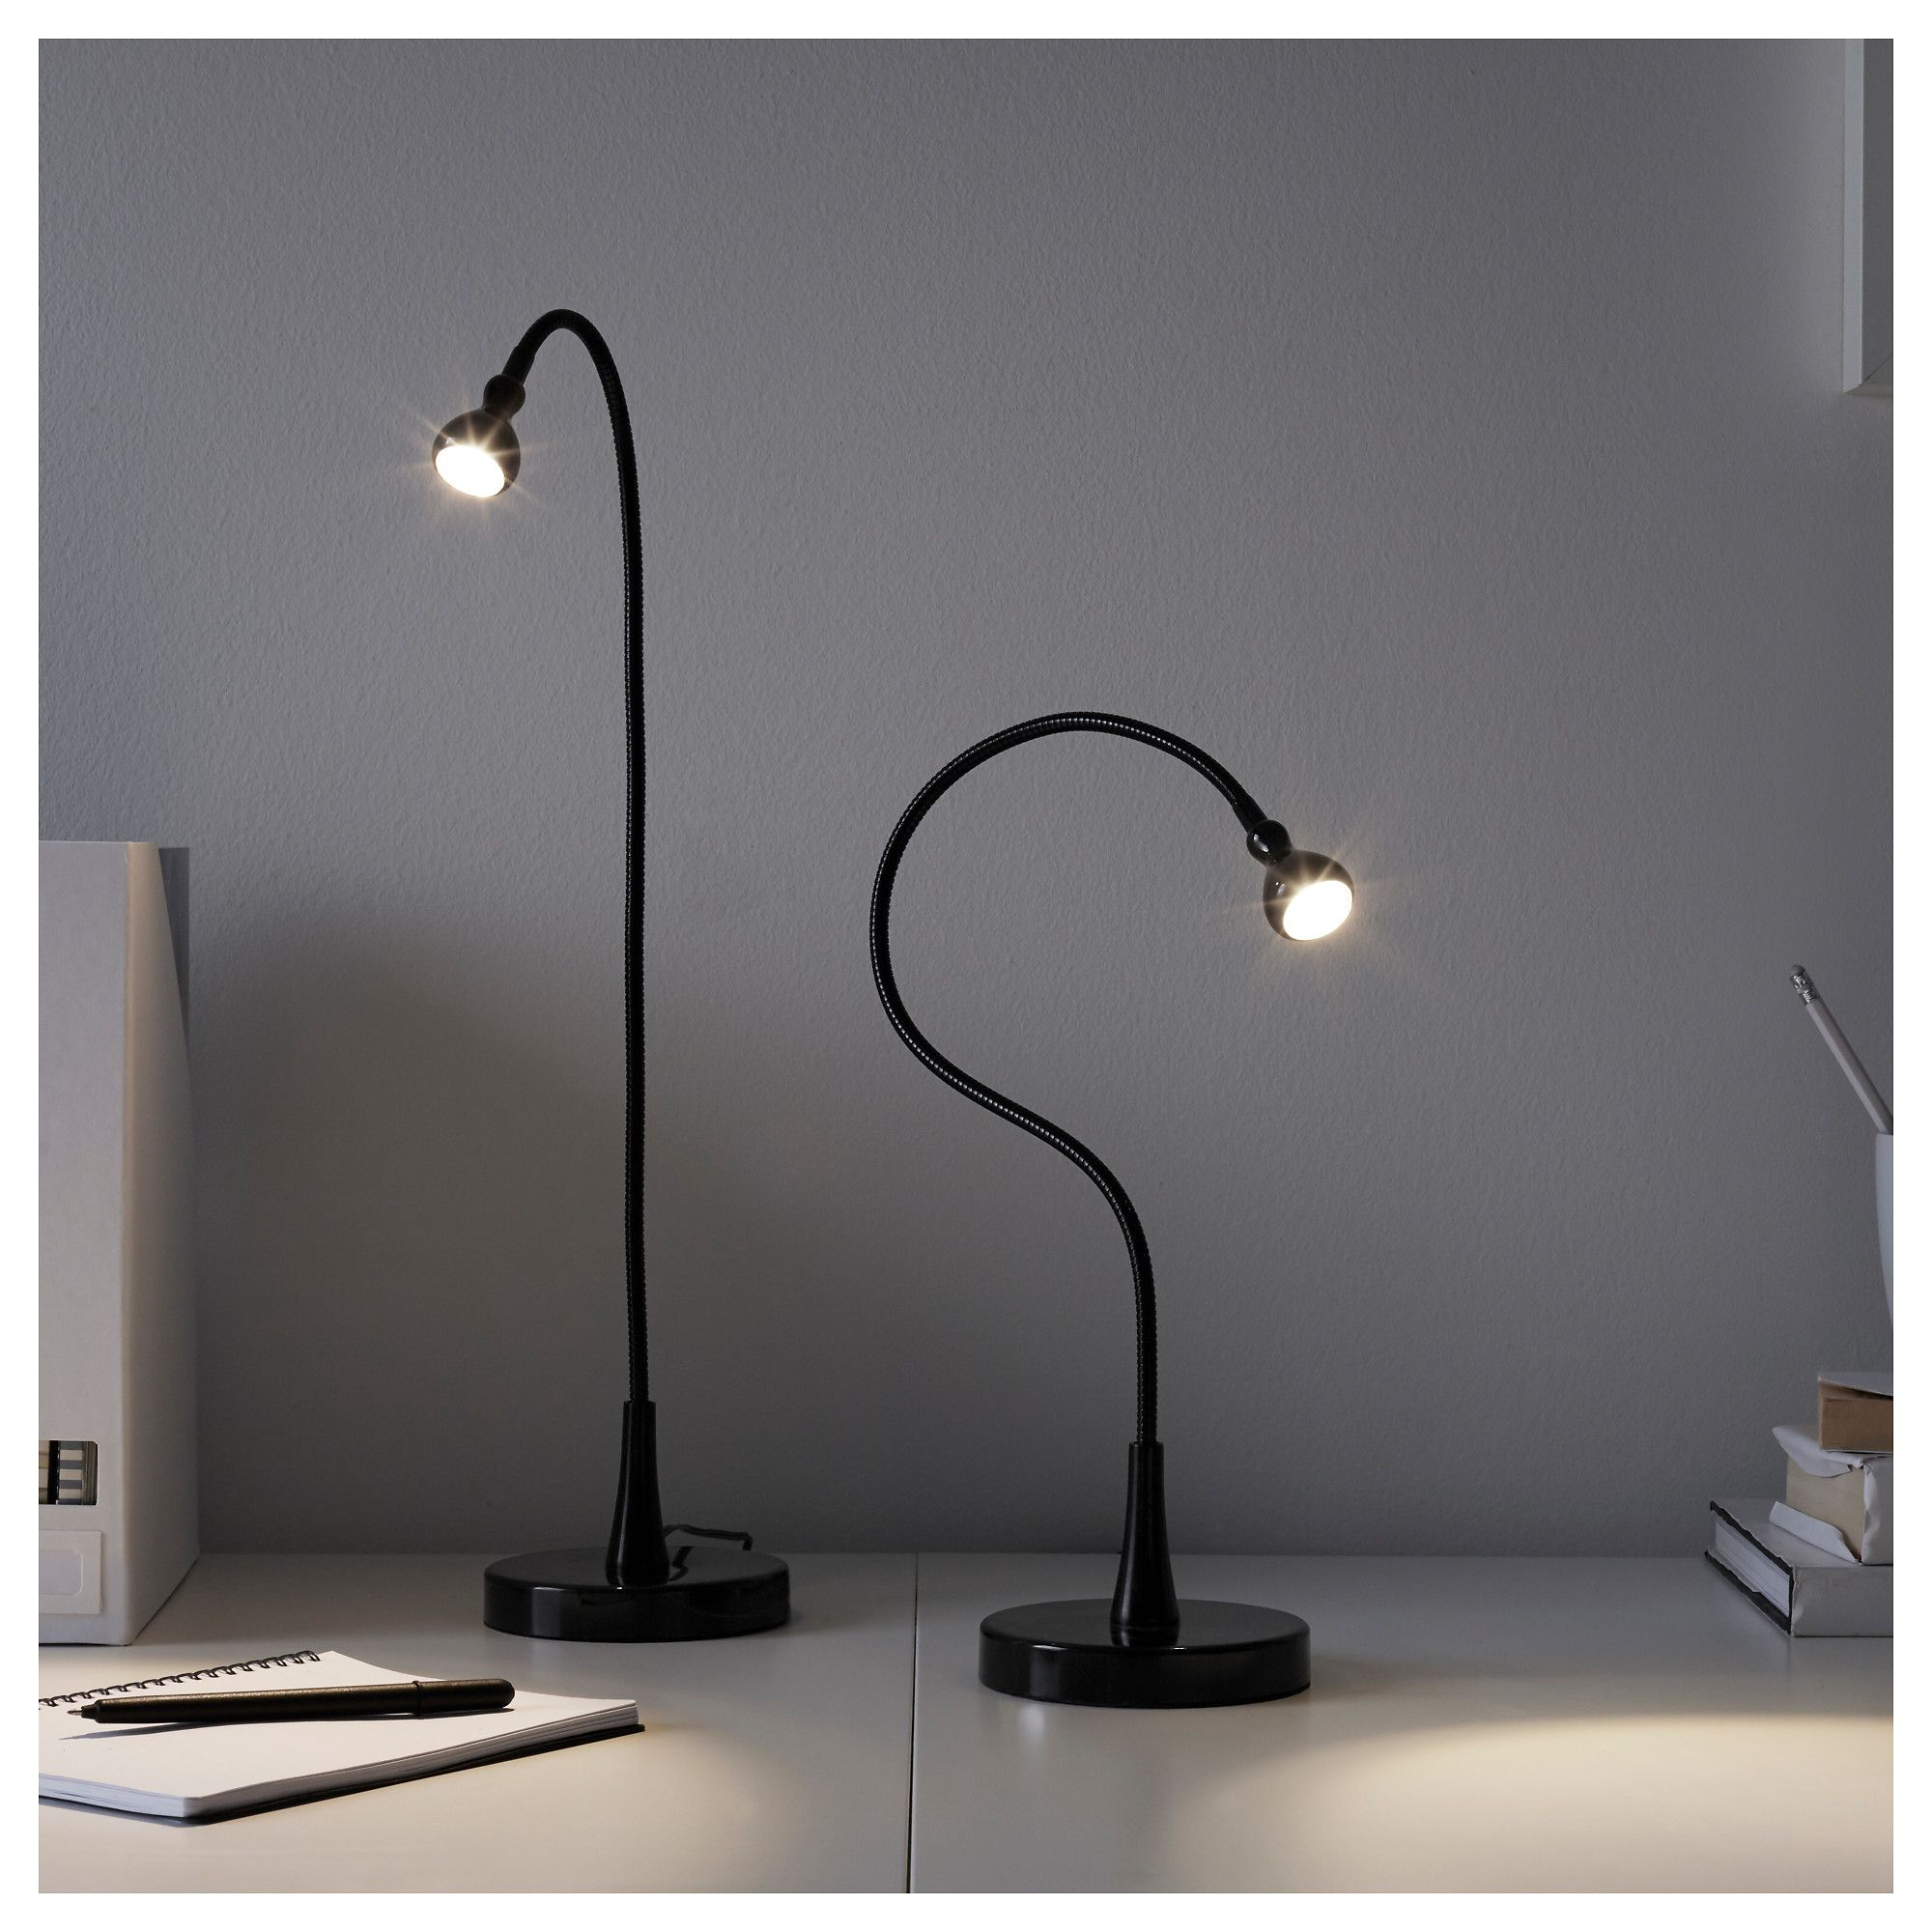 De À Lampe Bureau Et Jansjö BureauIkea LedNoir153 DH2EI9W